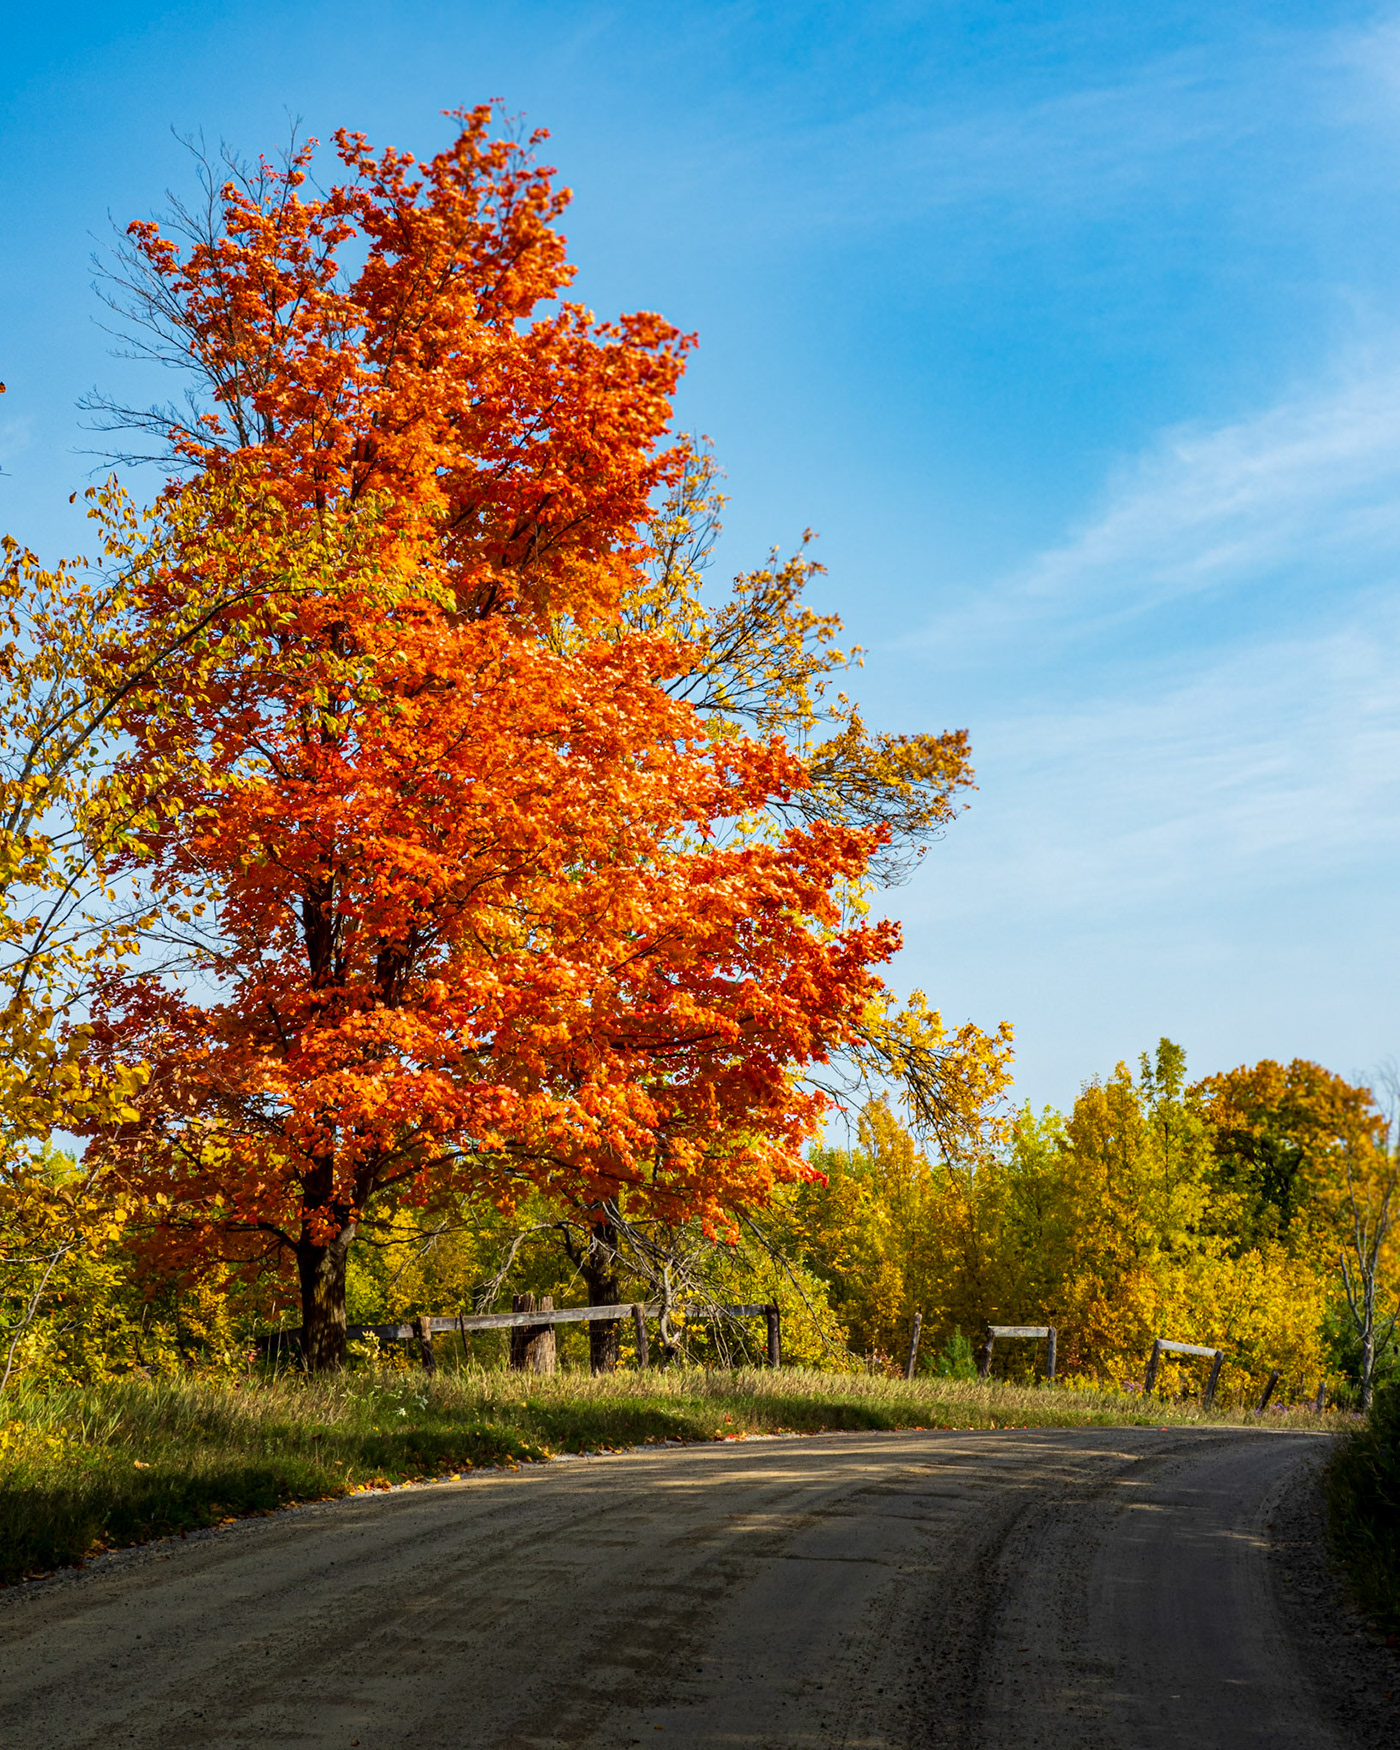 autumn color Fall Kawarthas landscapes Nature Ontario scenic